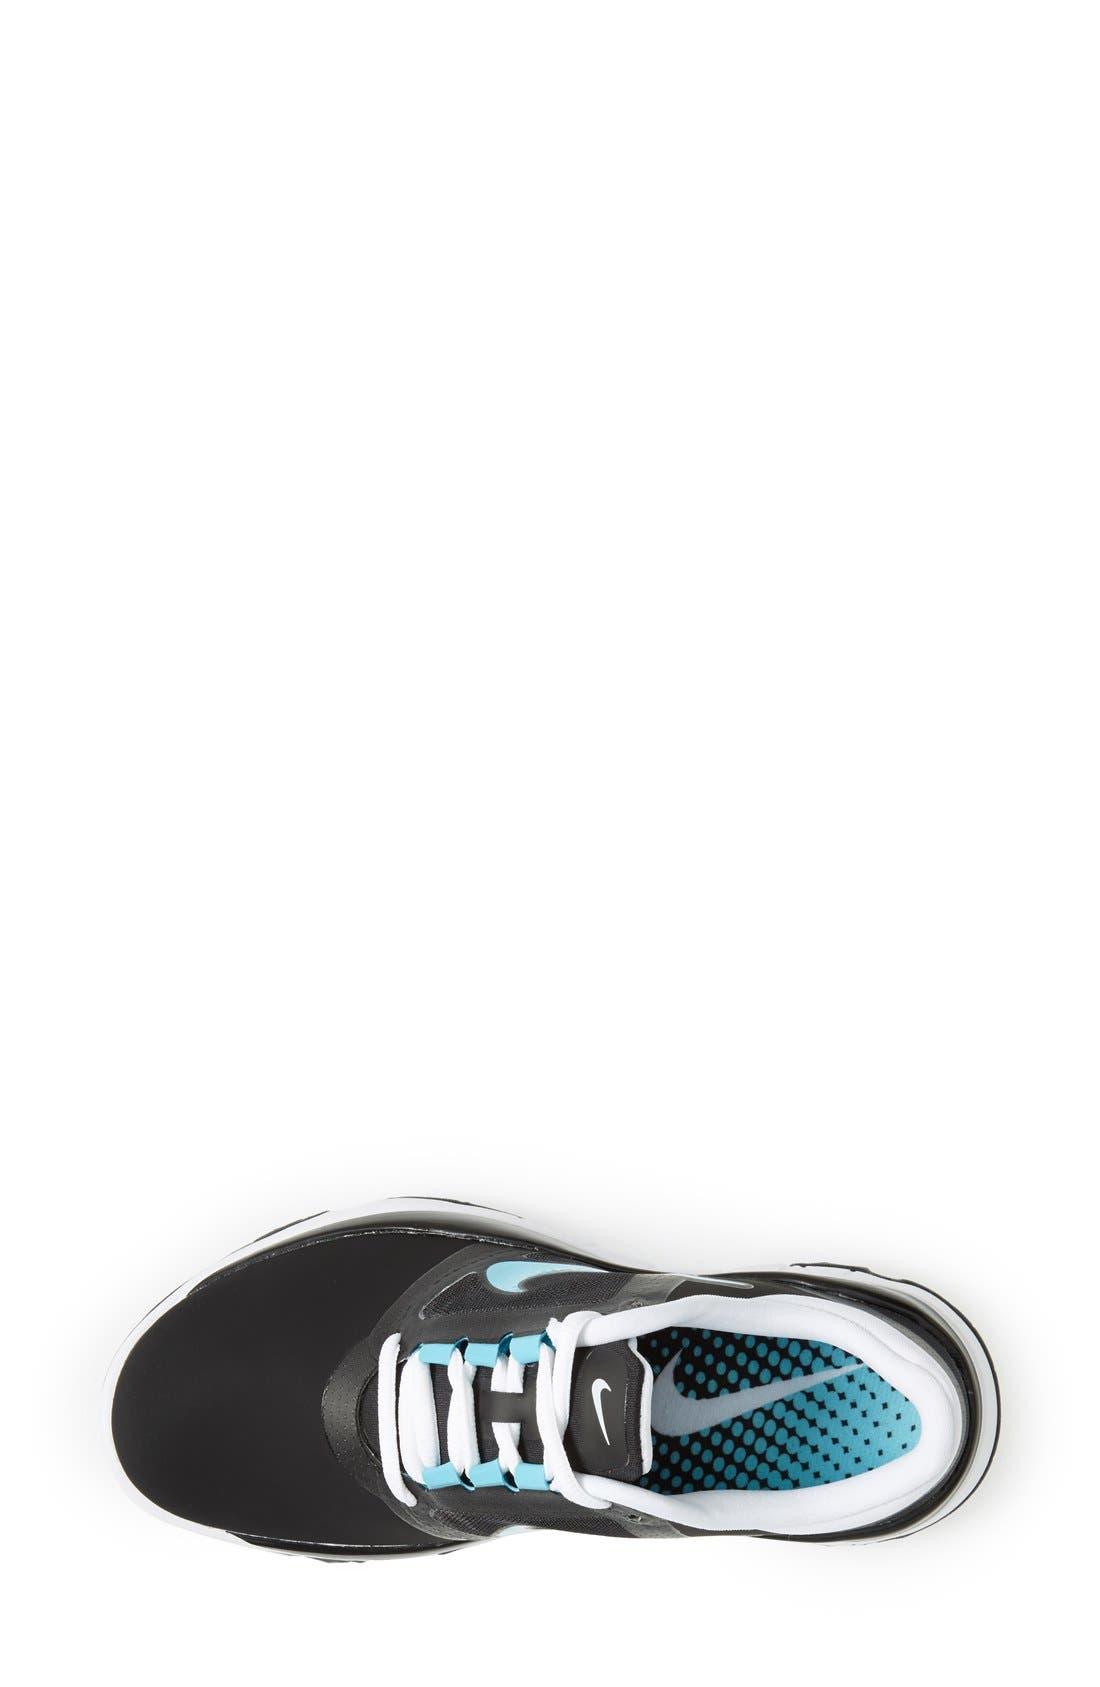 Alternate Image 3  - Nike 'Fi Impact' Waterproof Golf Shoe (Women)